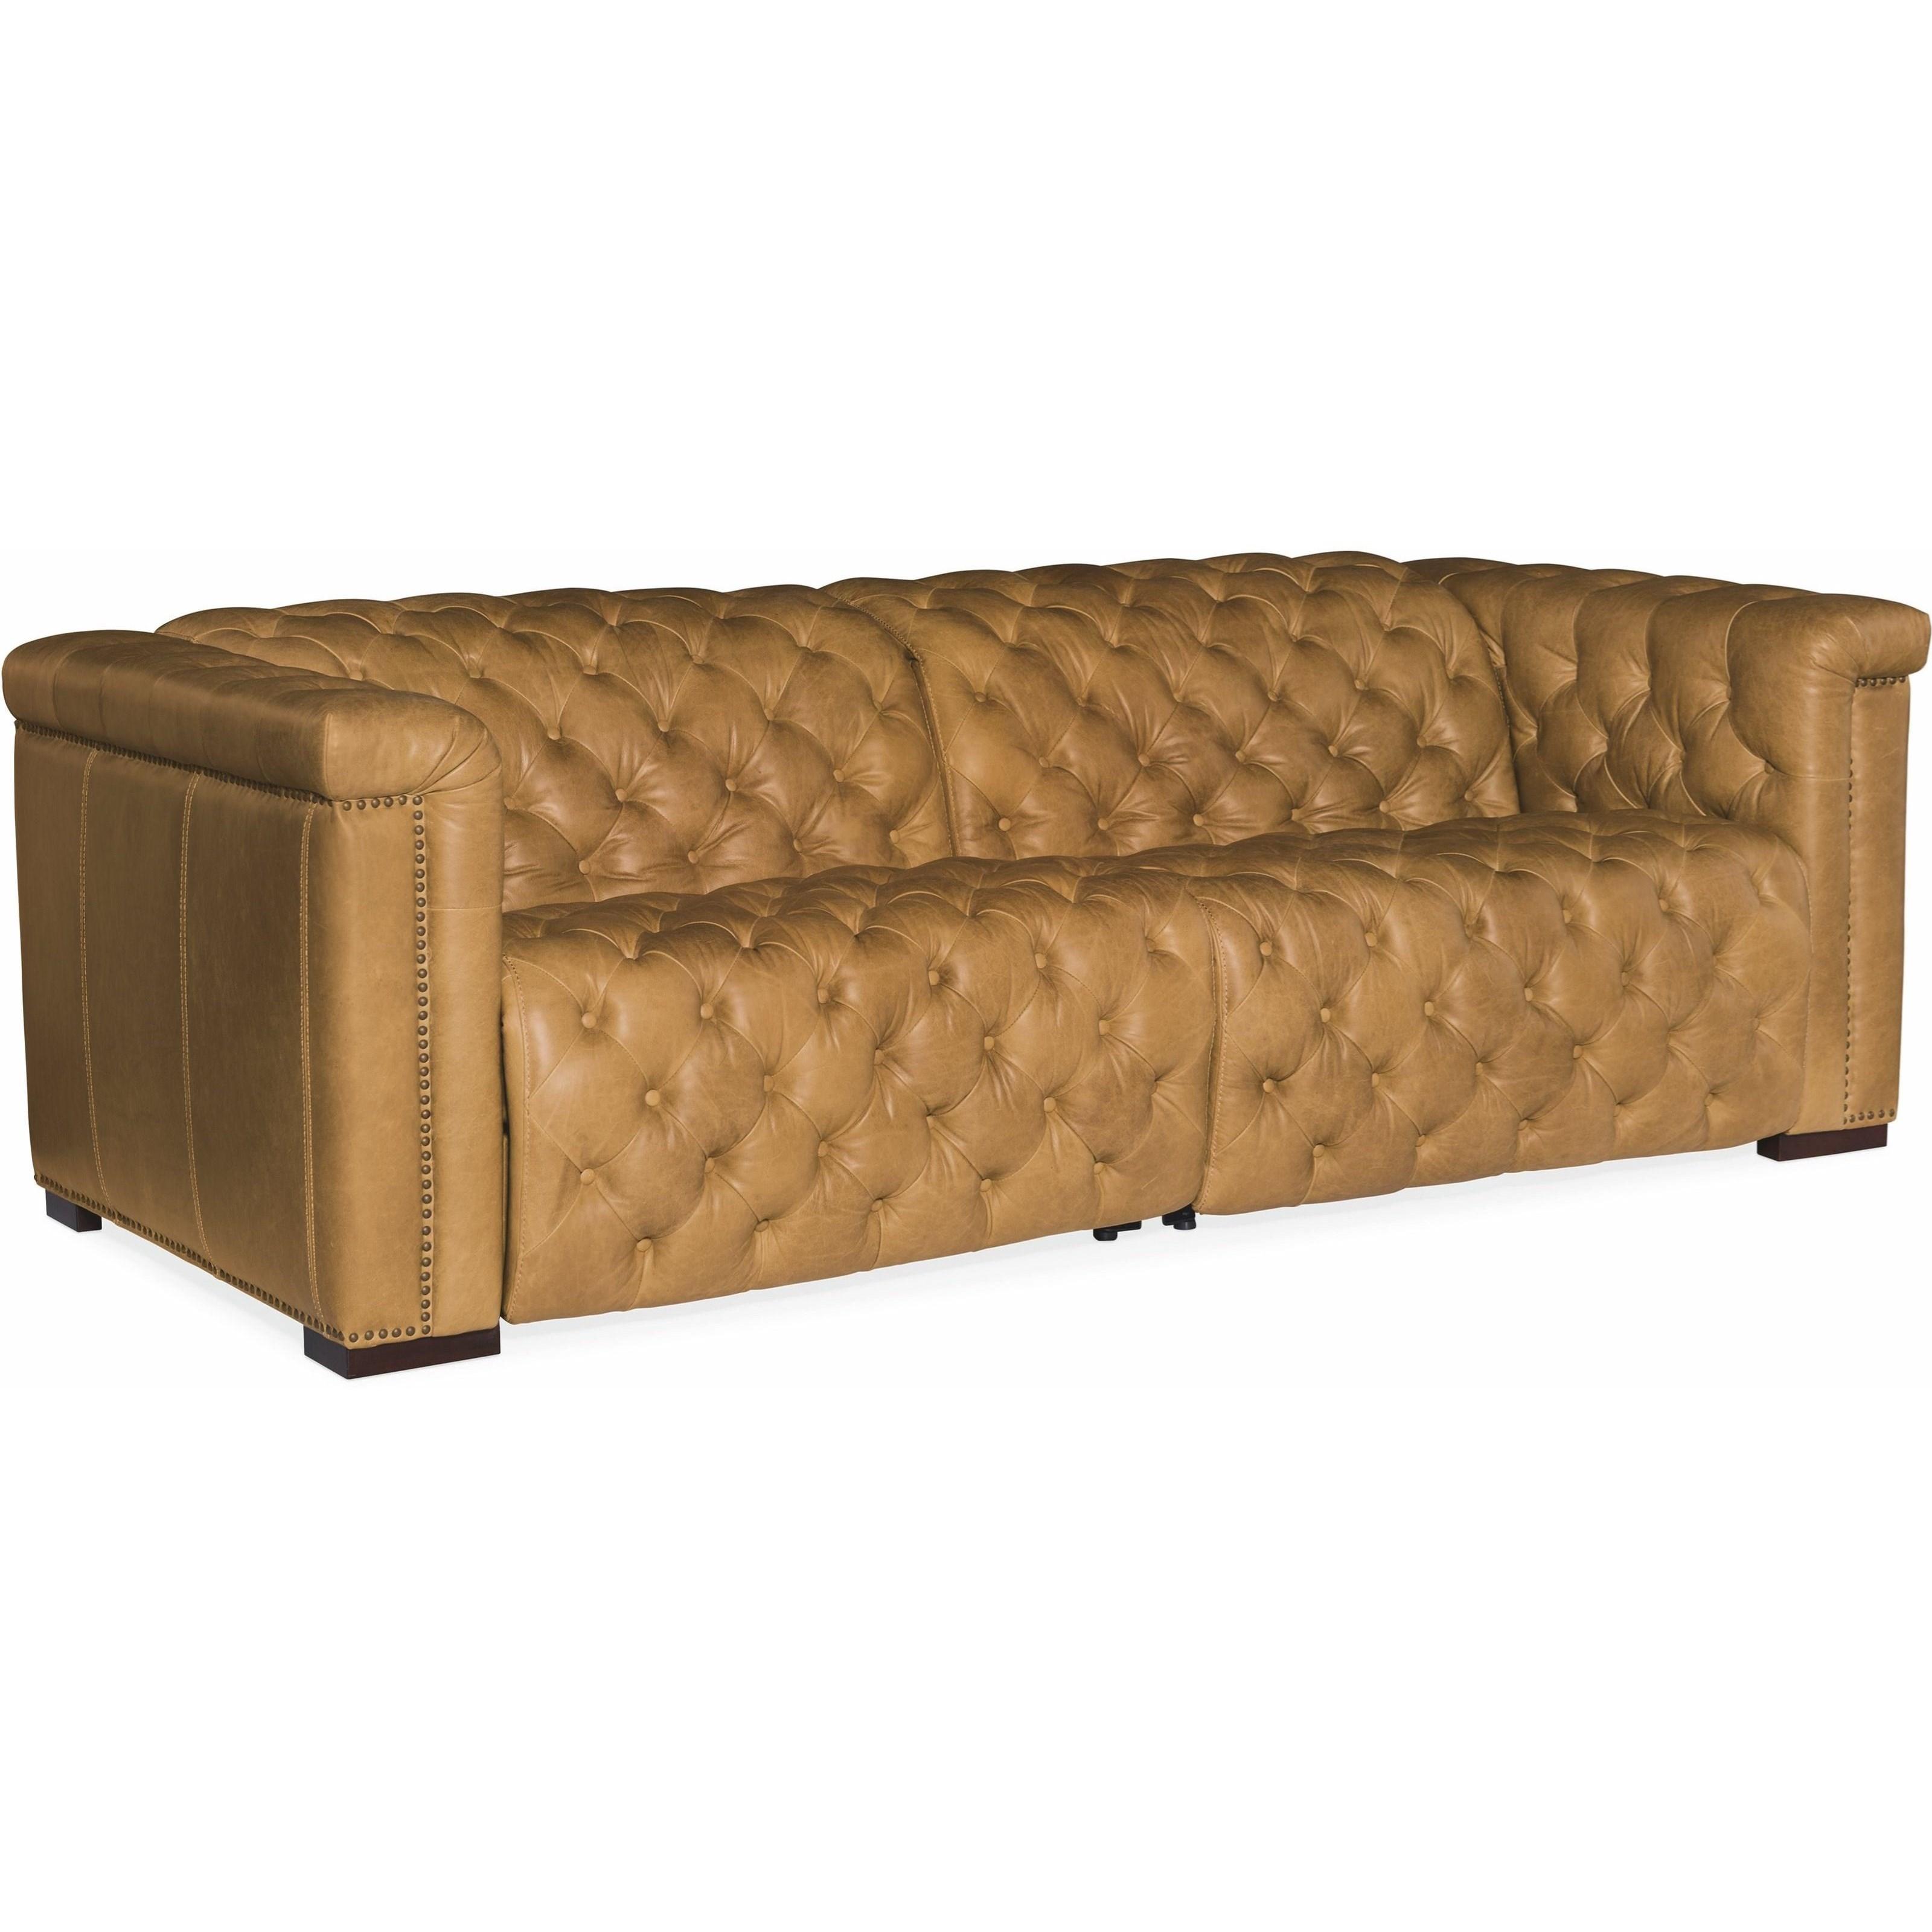 Savion Power Leather Motion Sofa by Hooker Furniture at Baer's Furniture